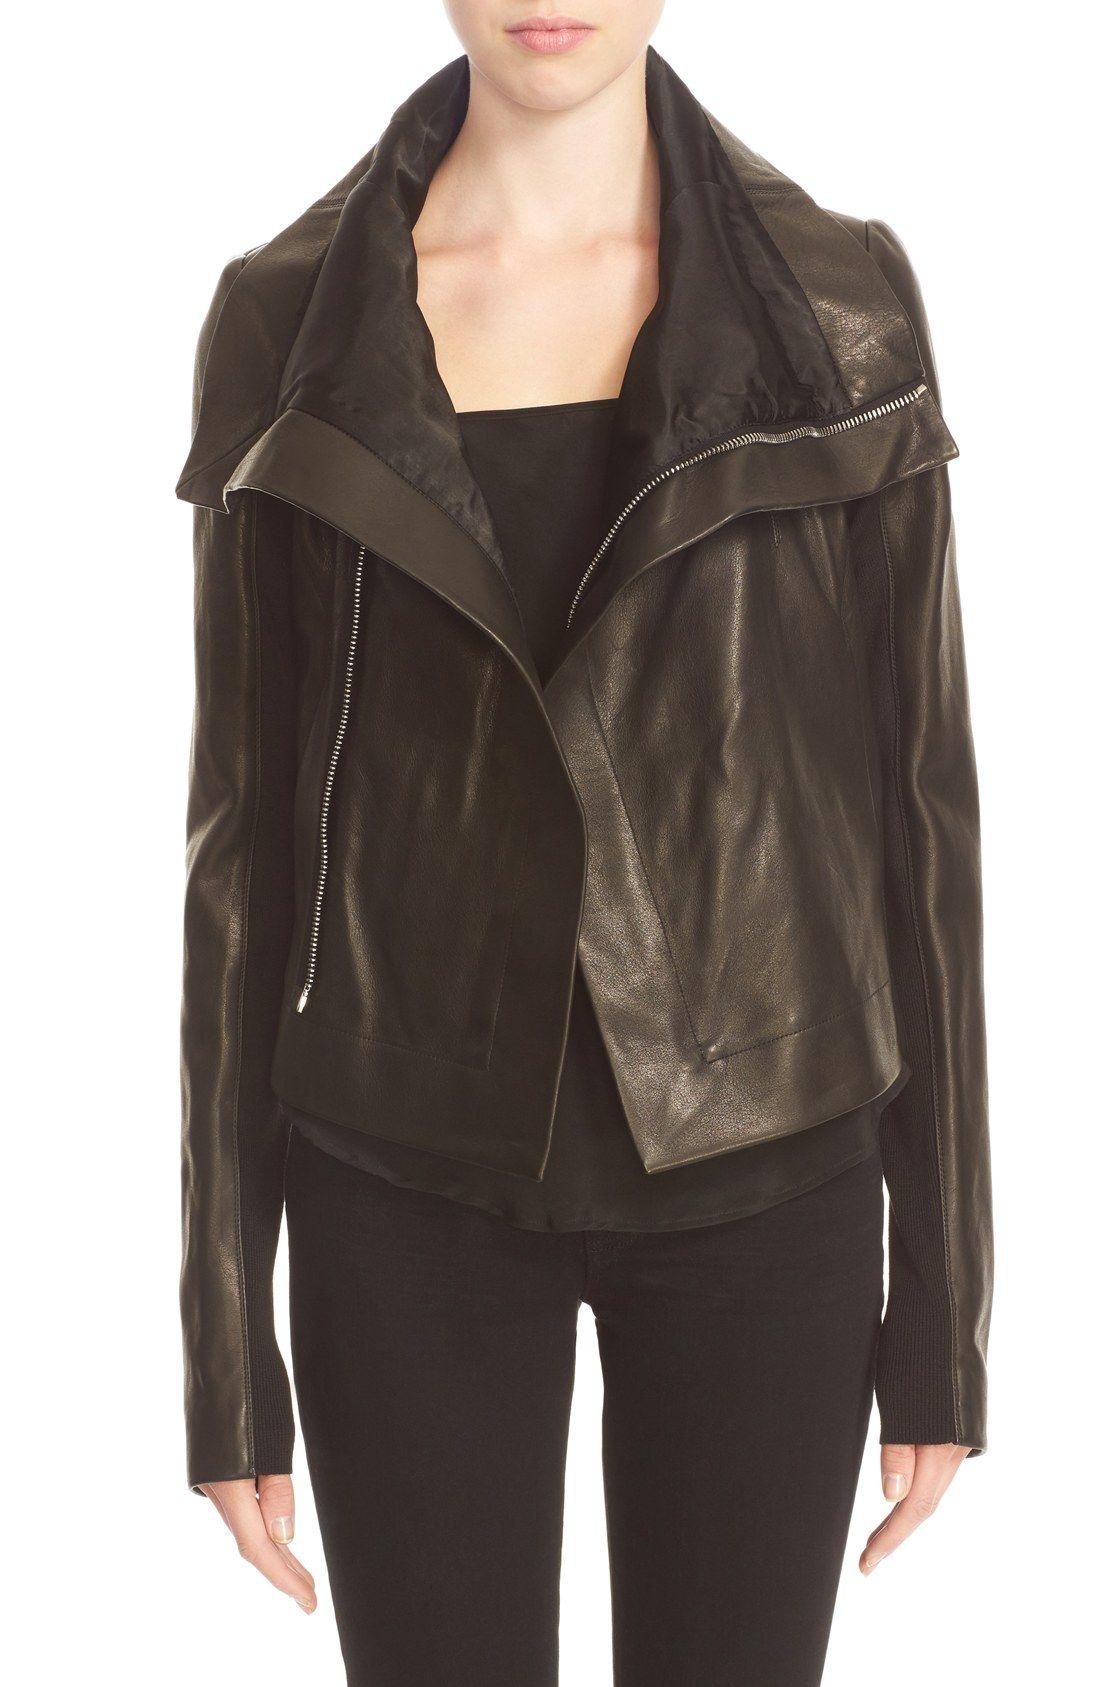 Rick Owens 'Clean' Leather Biker Jacket Reviews Leather